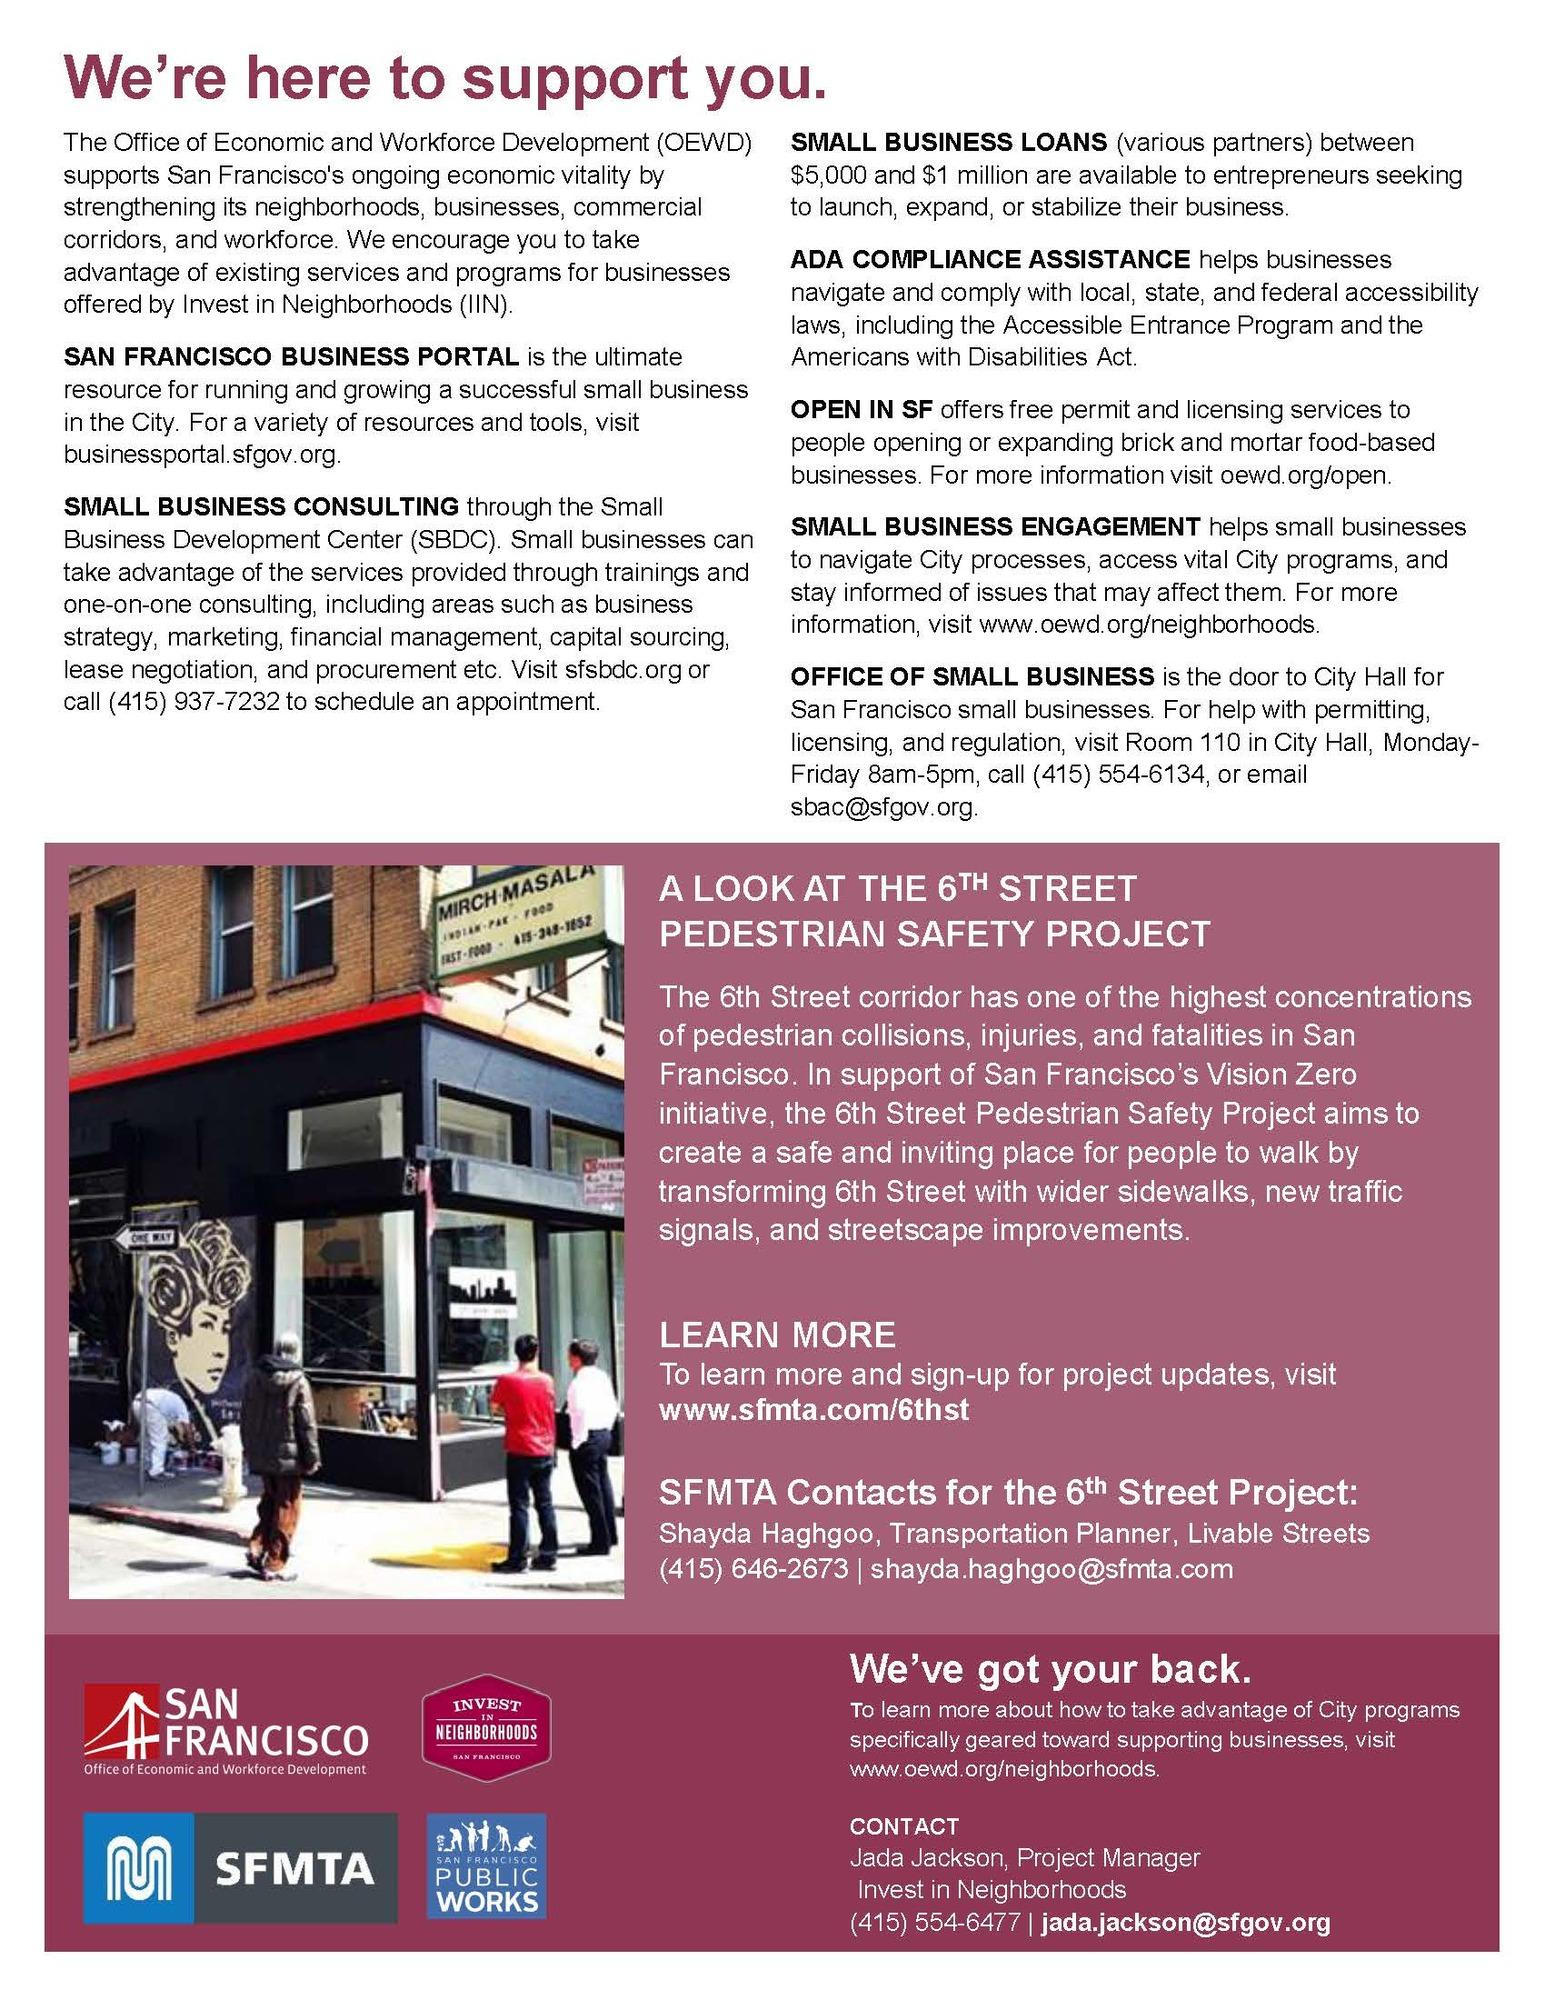 6th Street Construction Mitigation information 2